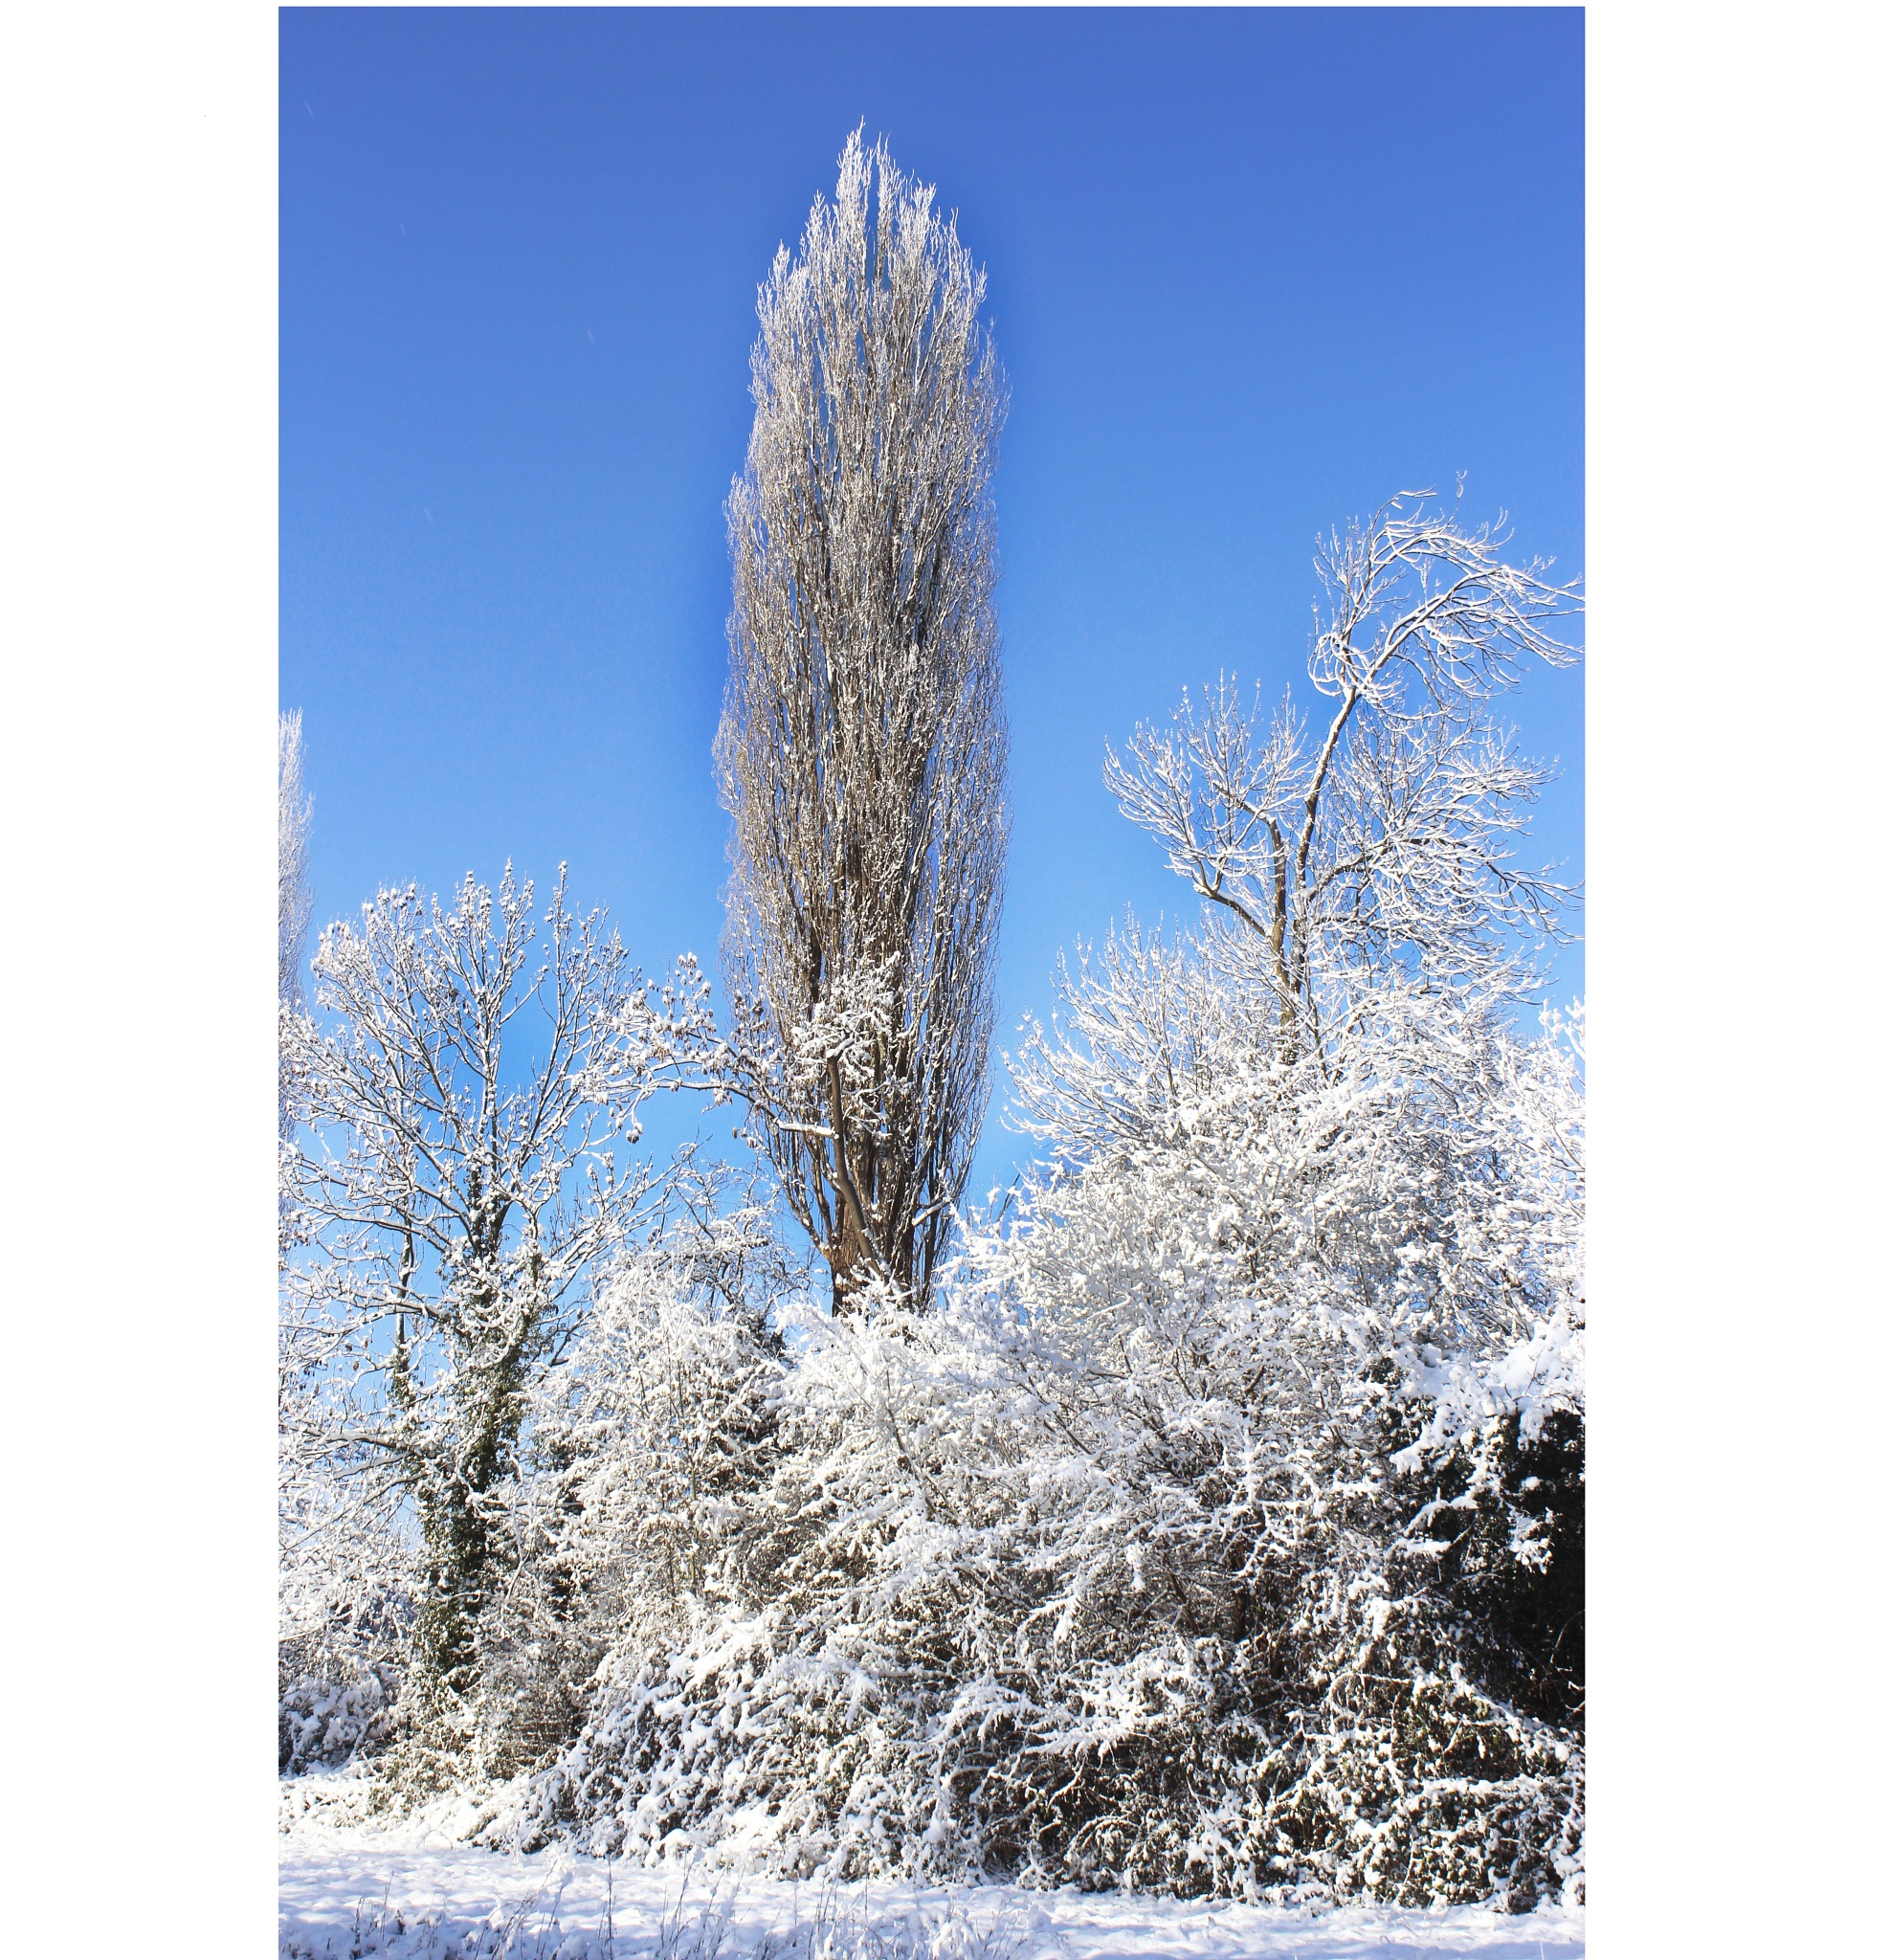 Frosty Botanic in Hanover by Frank Brandes